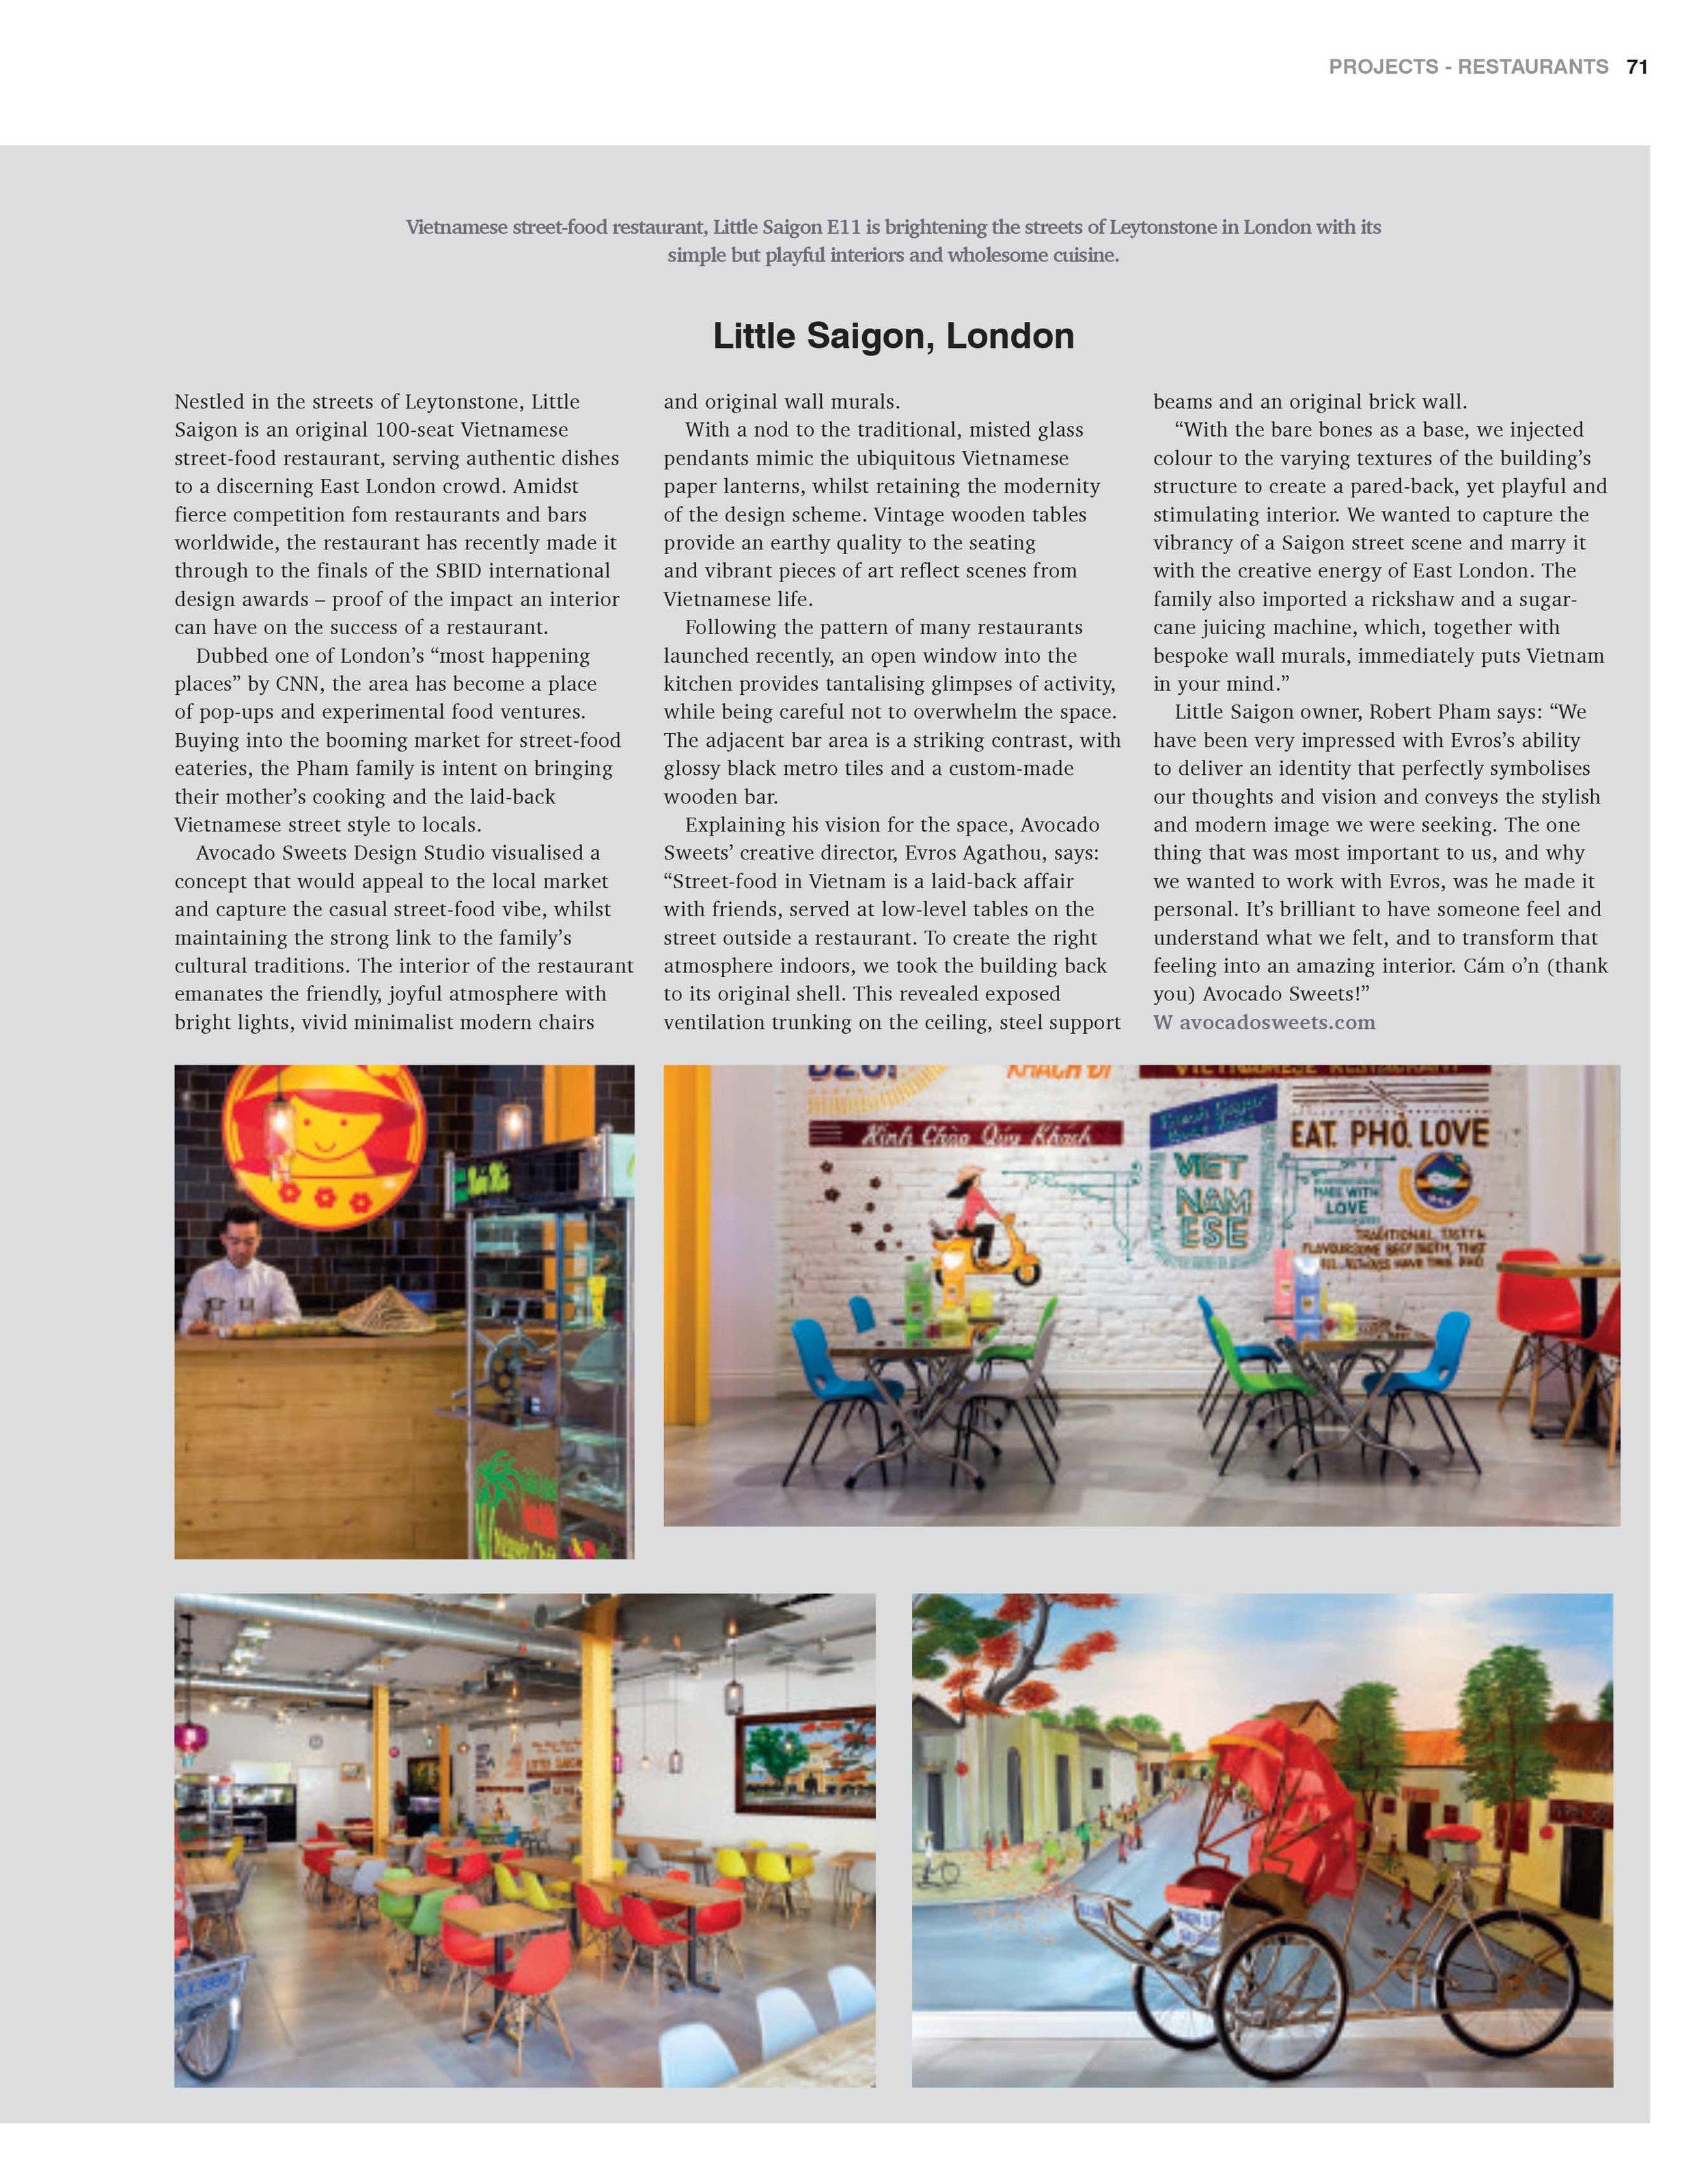 Little Saigon 2.jpg